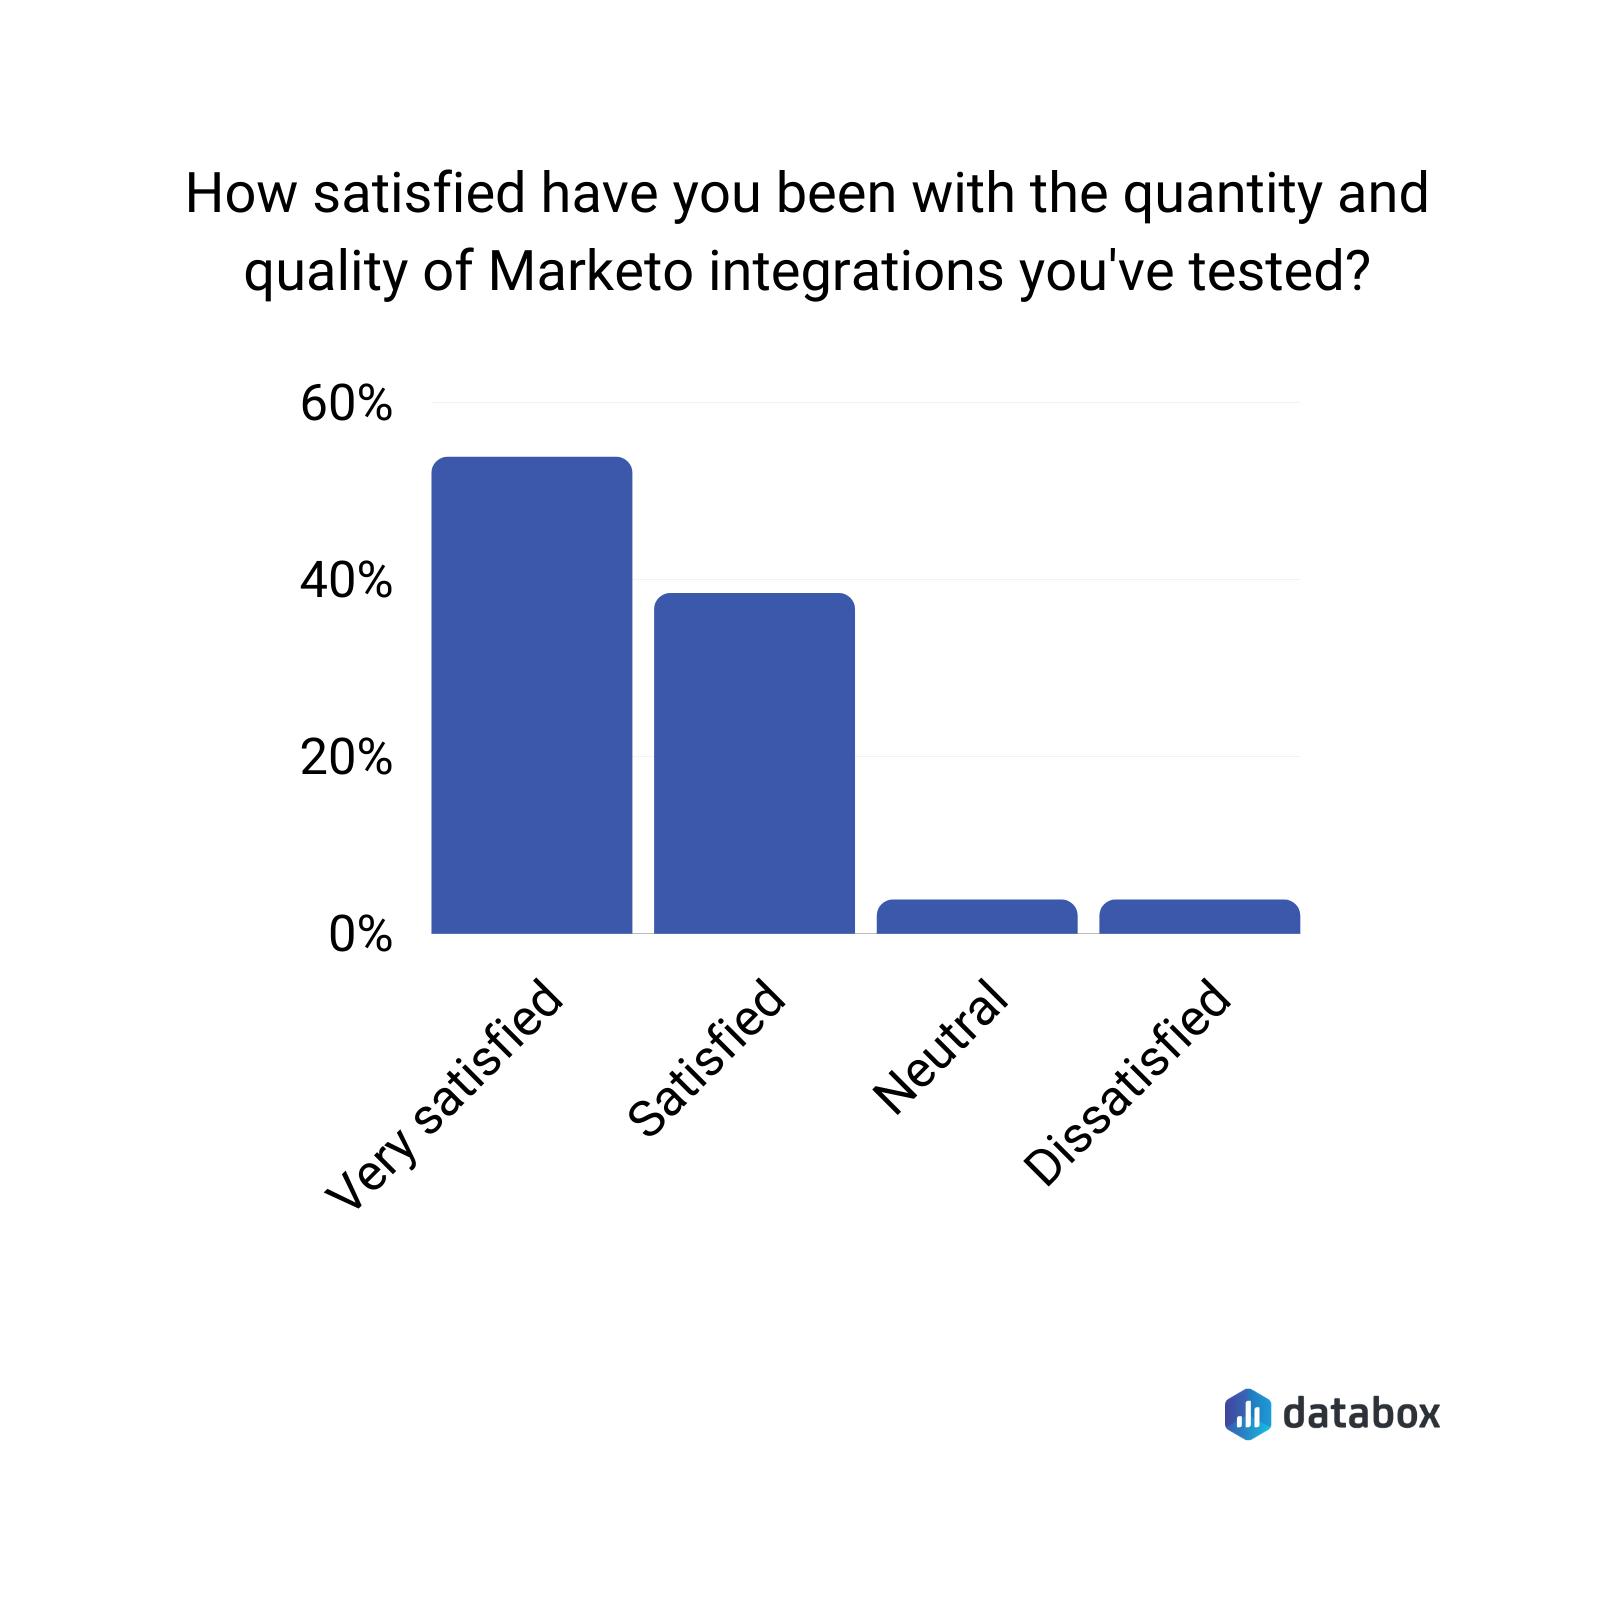 Marketo-integrations-level-of-user-satisfaction-data